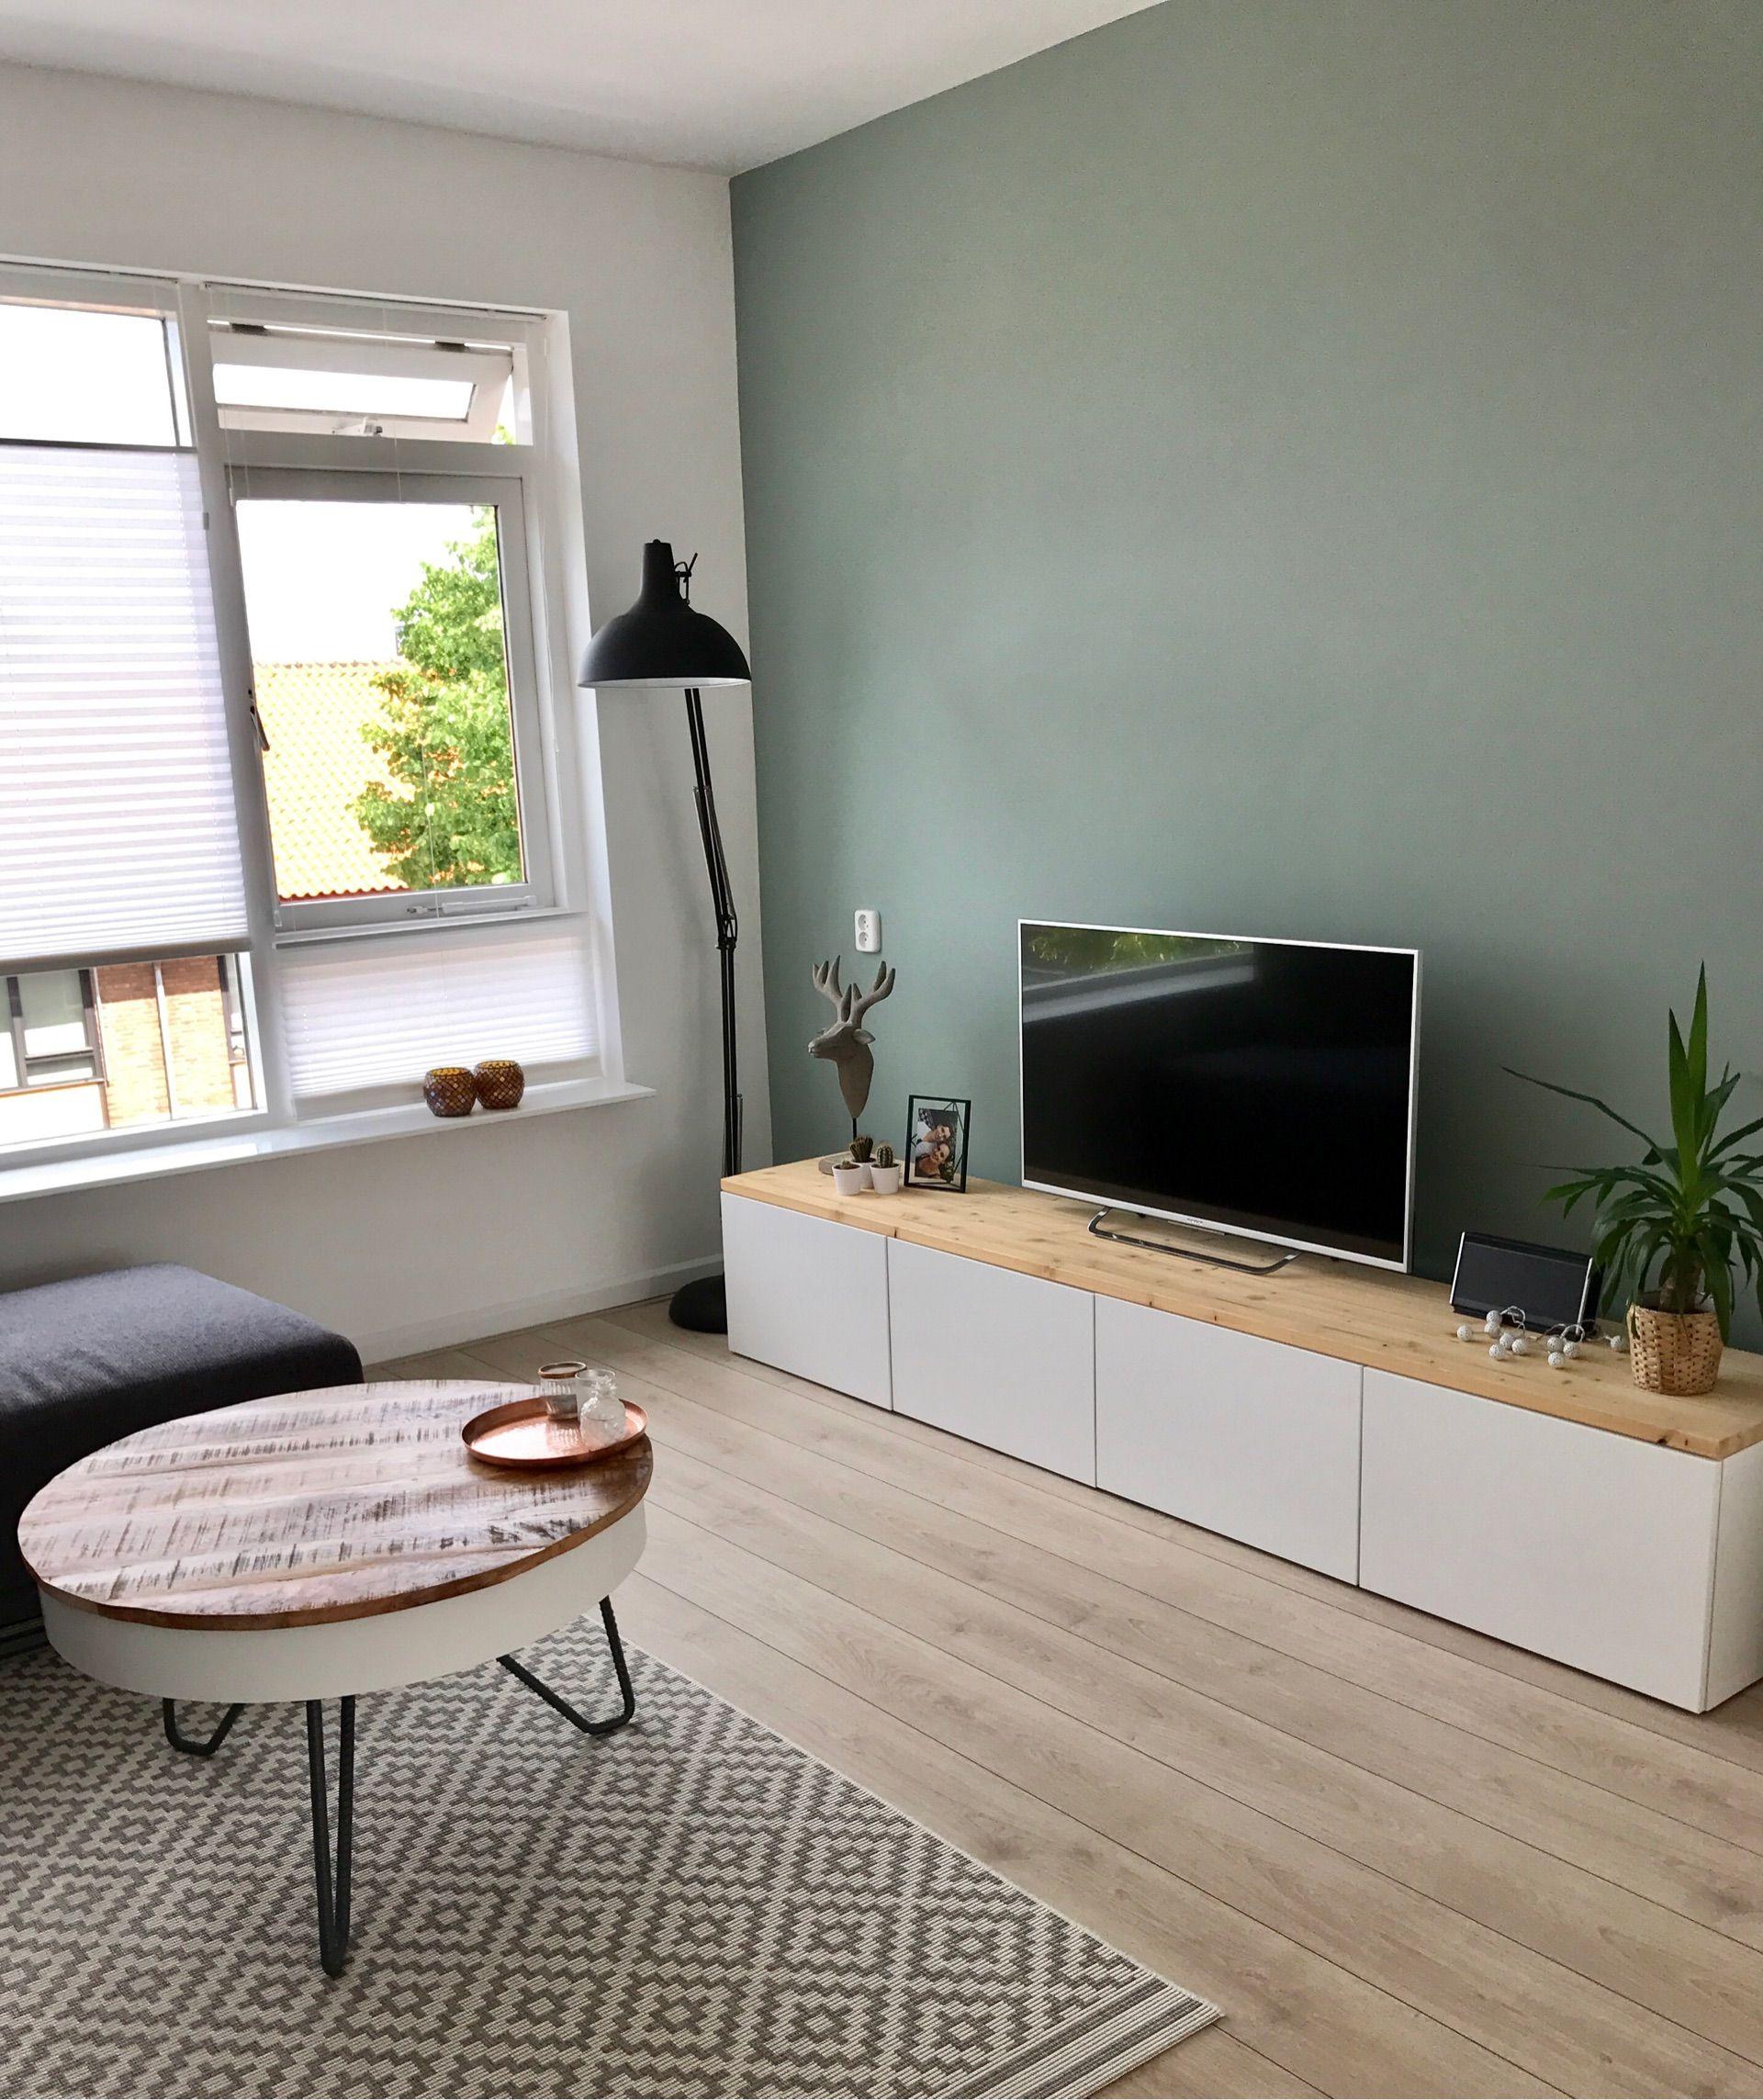 Woonkamer  Binnenkijken bij lisanne8 in 2019  living